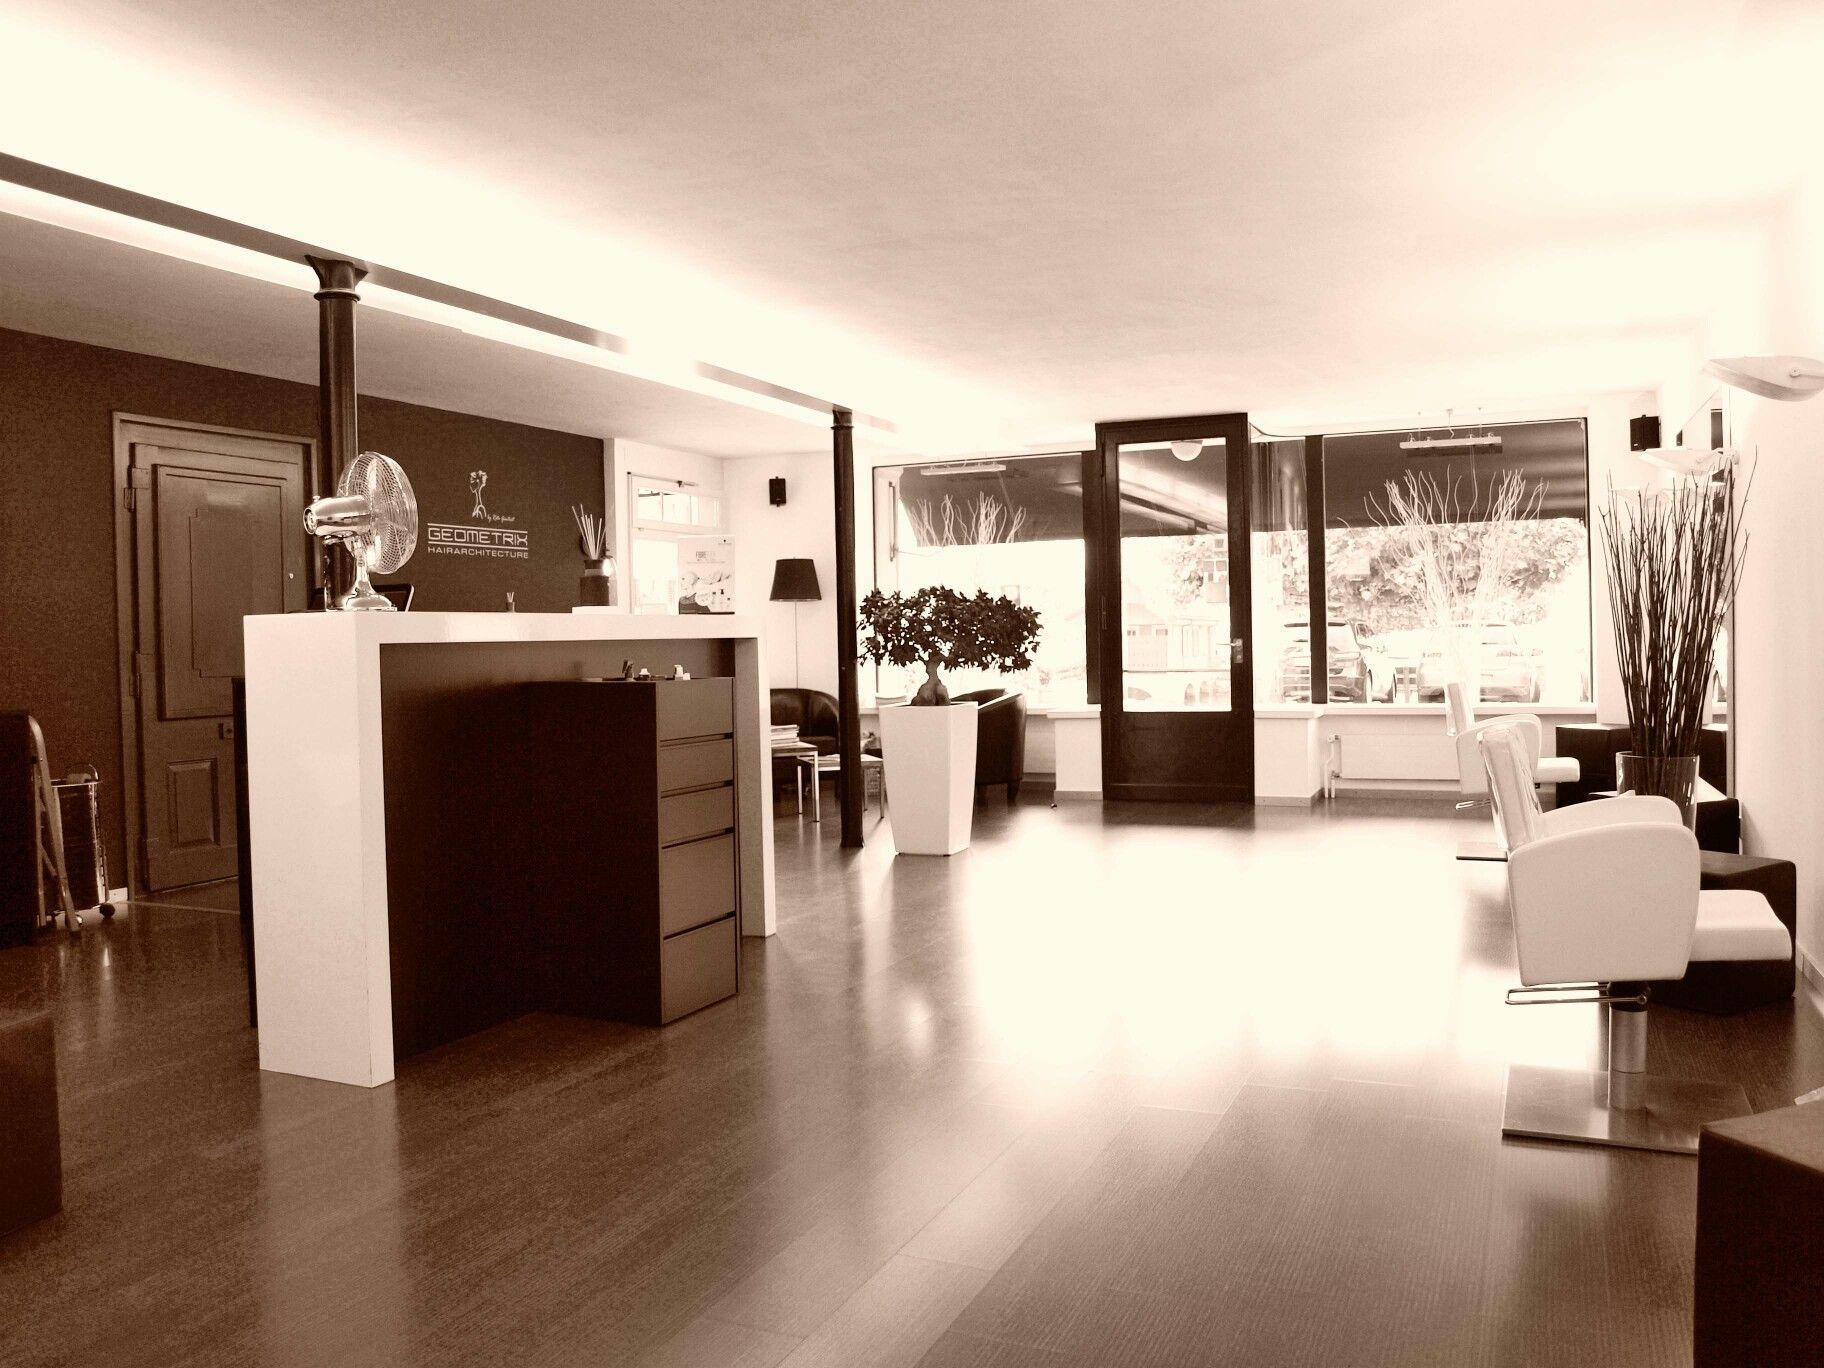 Geometrix, Salon, Coiffeur, Seestrasse 45, 8712 Stäfa   Coiffeur ...